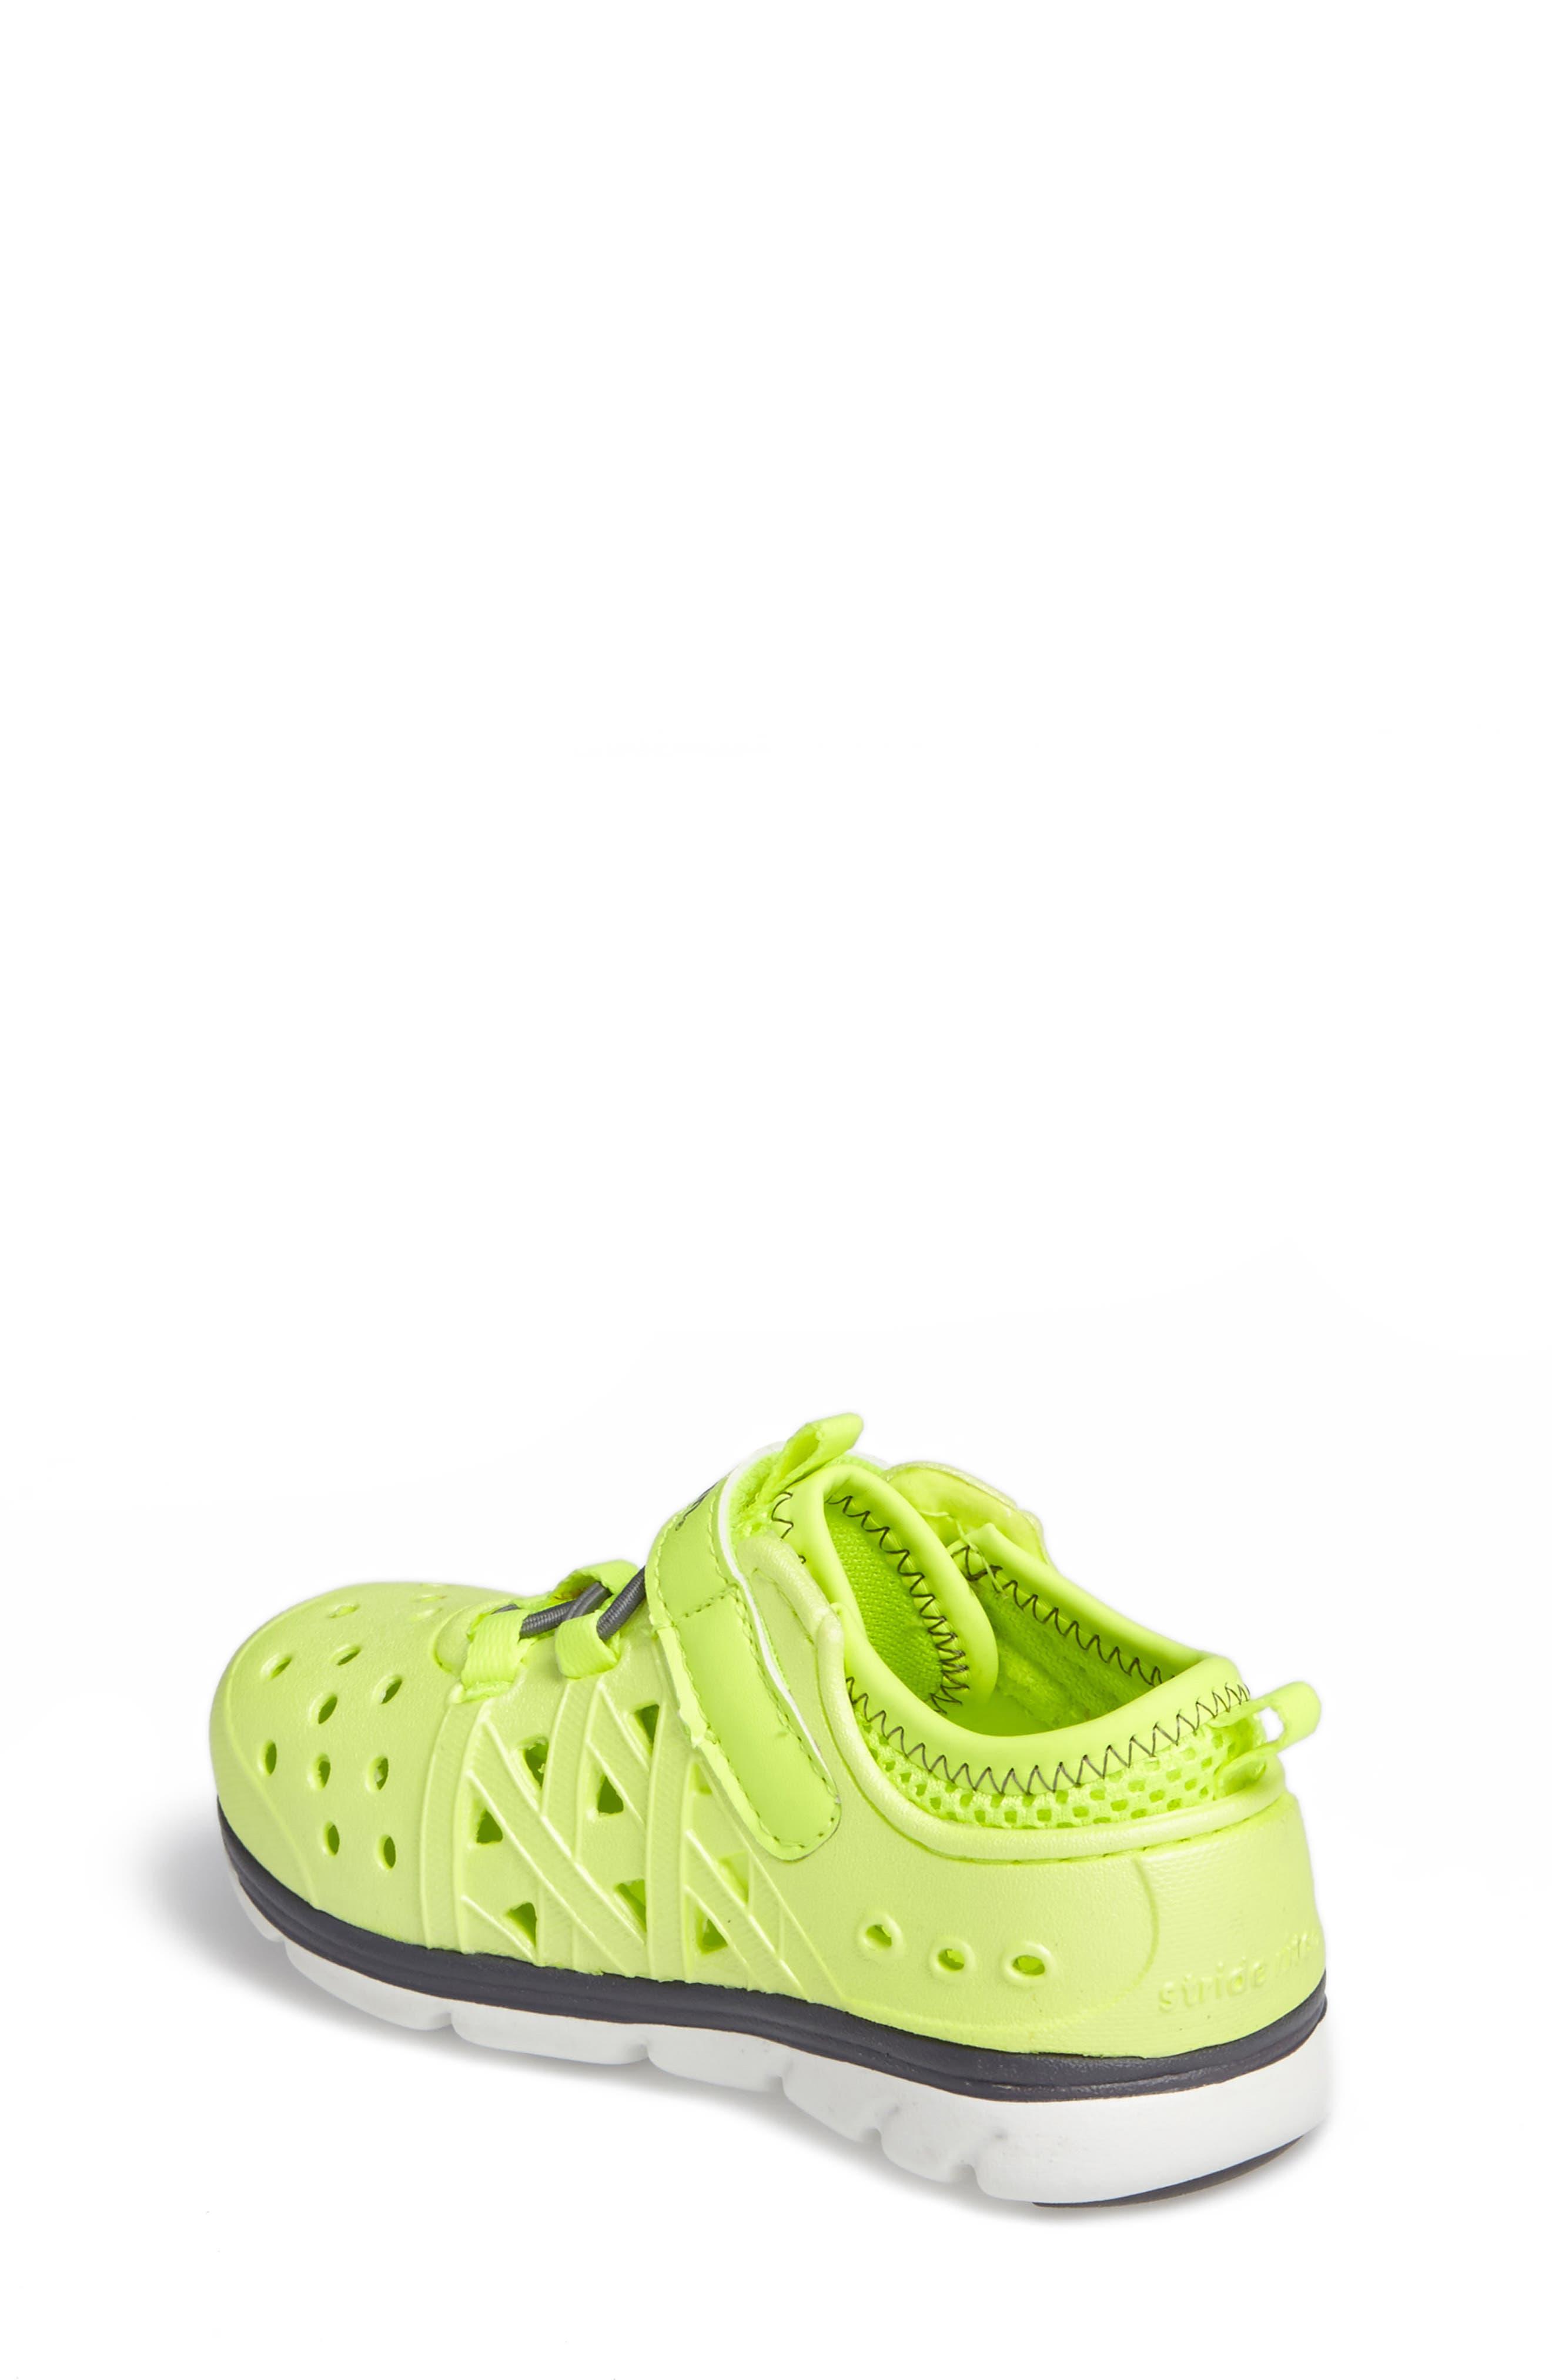 Made2Play<sup>®</sup> Phibian Sneaker,                             Alternate thumbnail 2, color,                             Citron Metallic